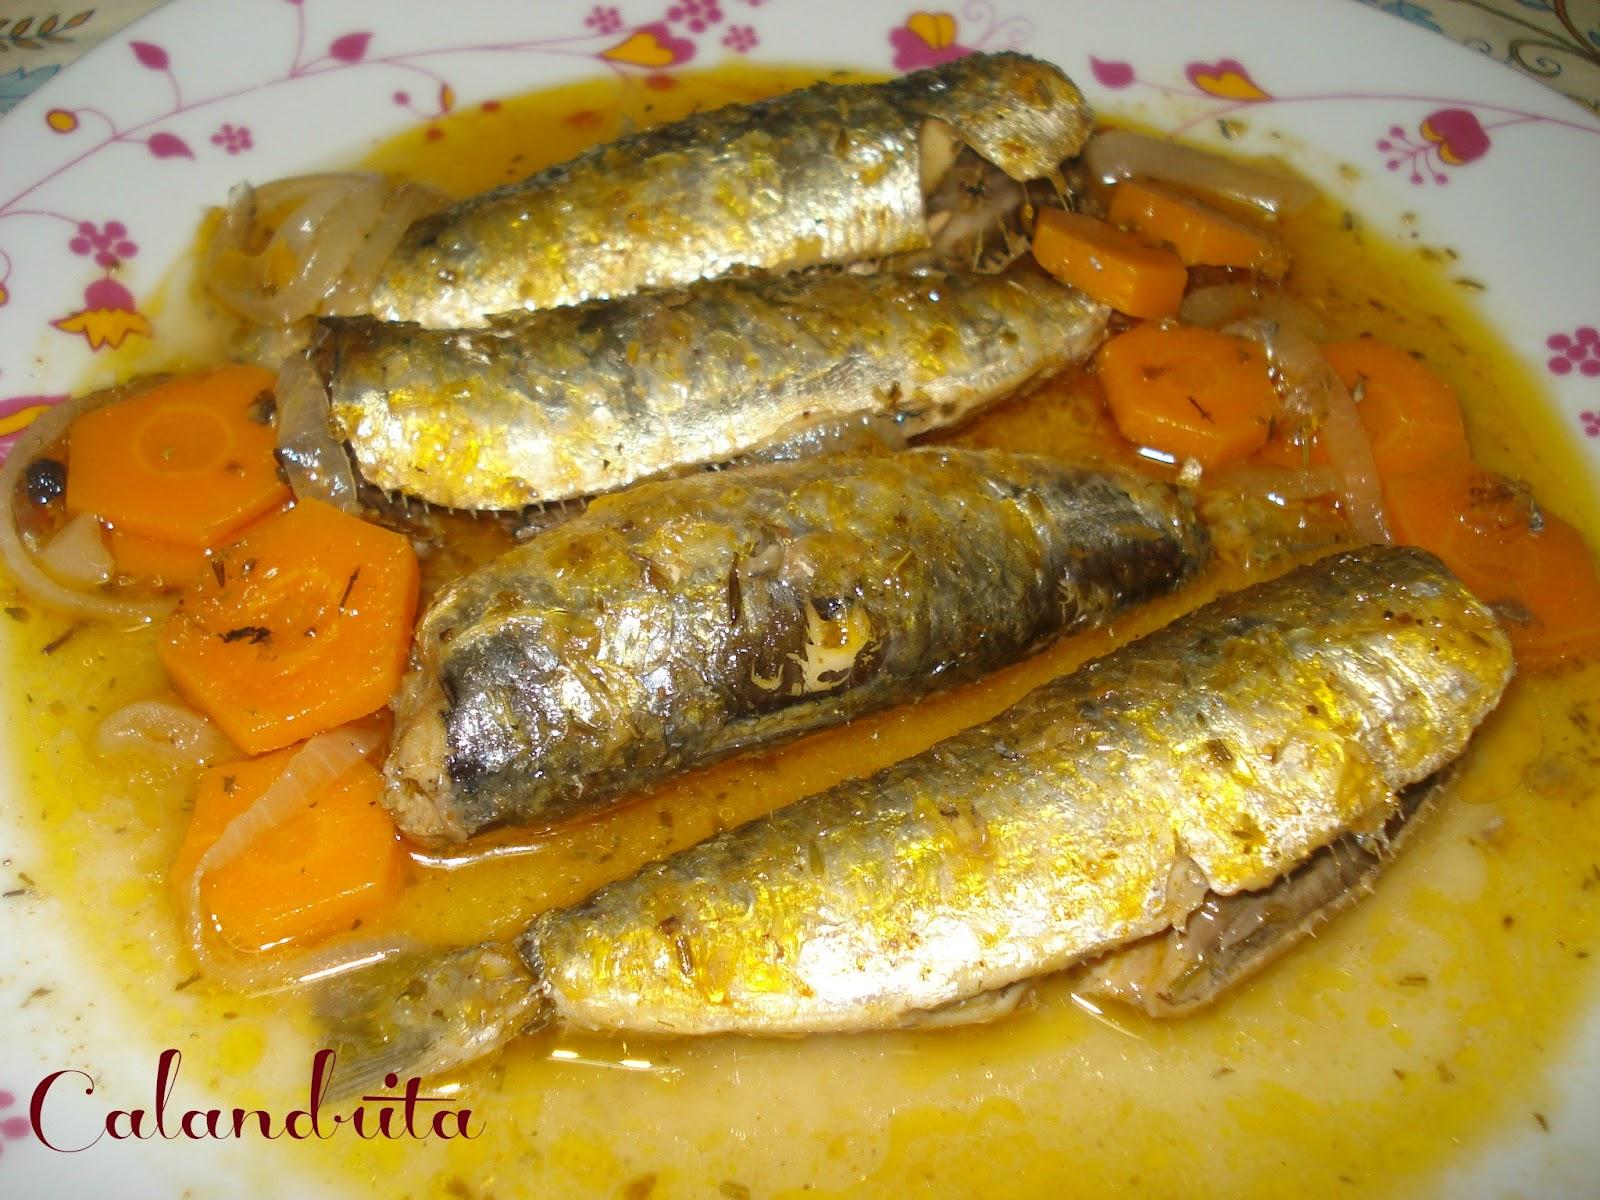 La cocina de calandrita sardinas en escabeche - Como cocinar sardinas ...